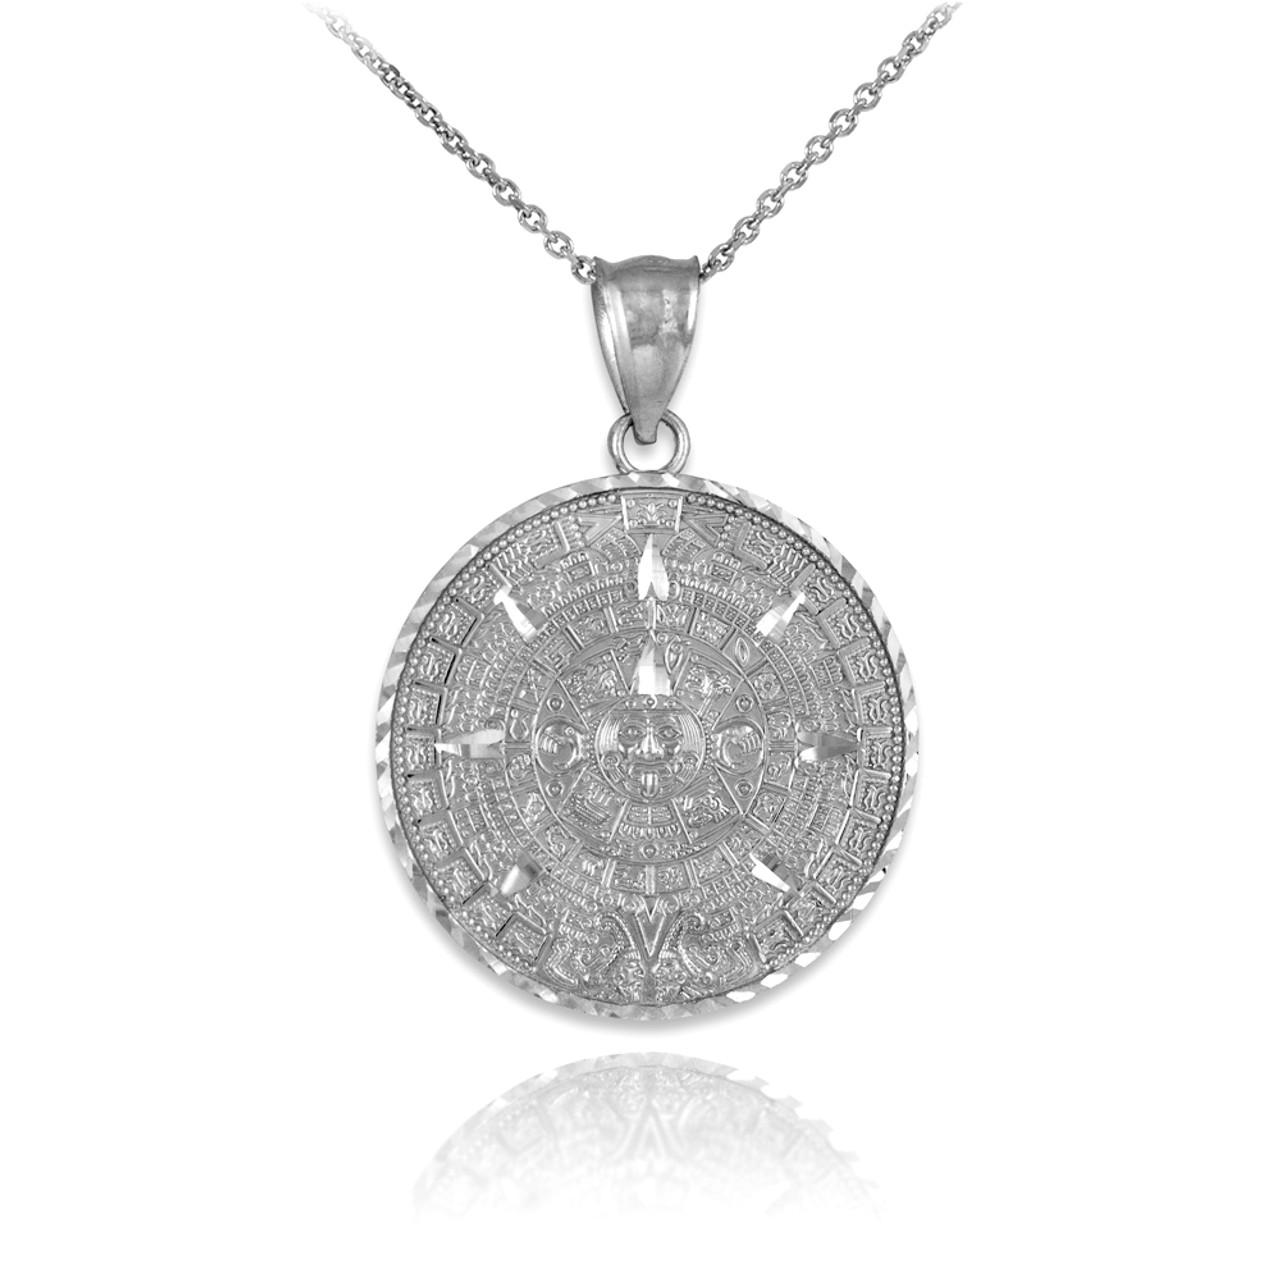 Silver aztec mayan sun calendar pendant necklace aloadofball Image collections